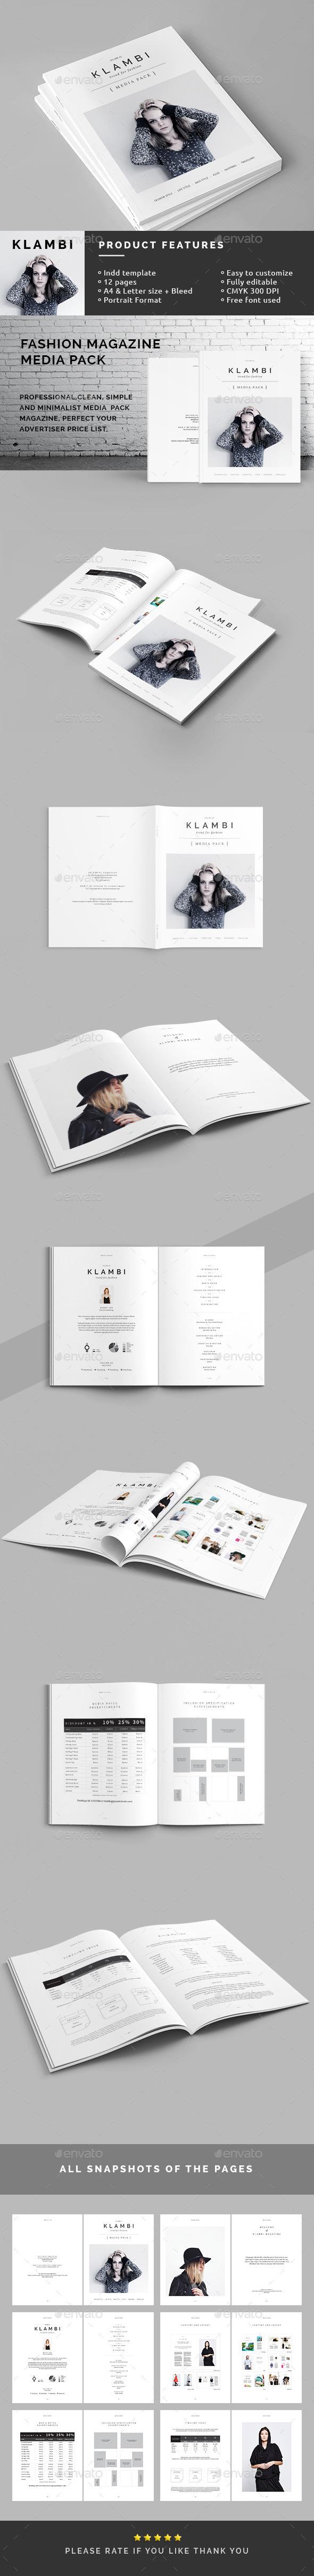 Fashion Magazine Media Pack - Magazines Print Templates